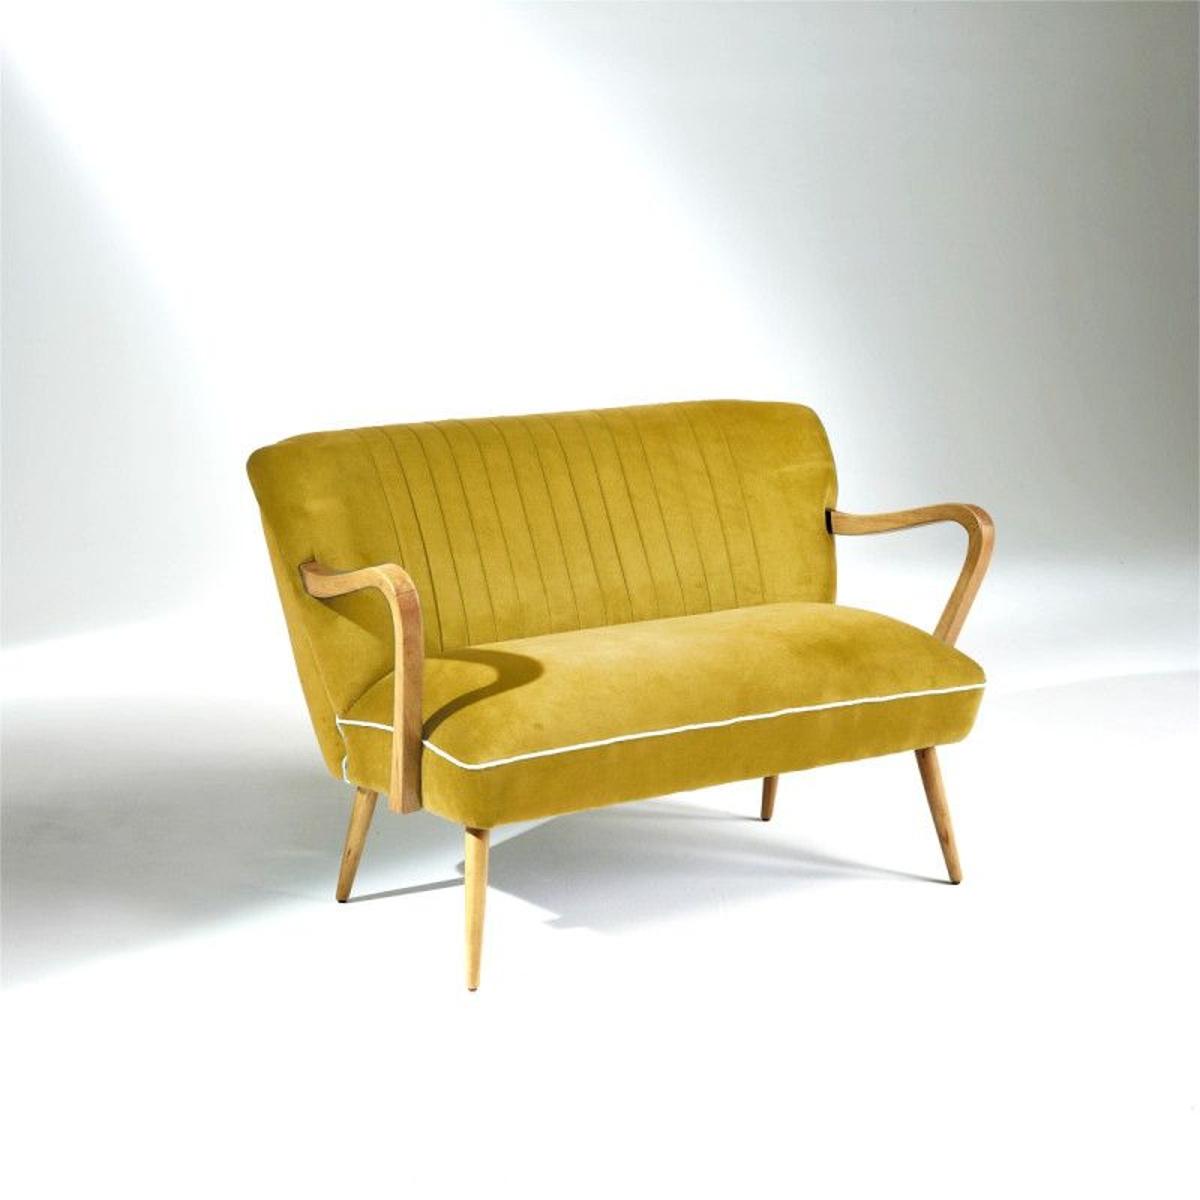 Banquette Vintage SIXTY, jaune moutarde